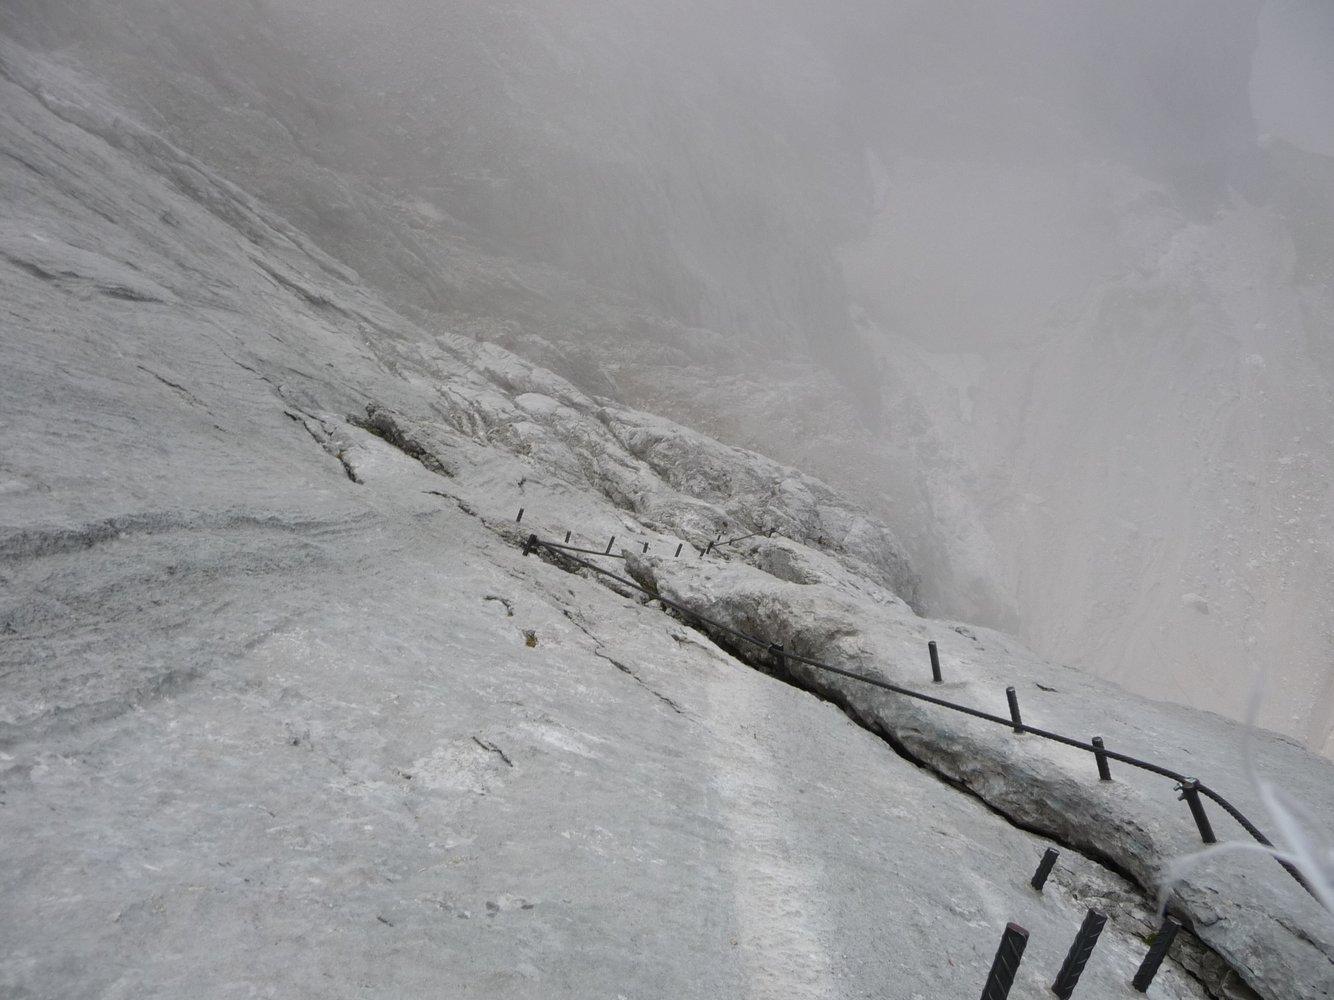 Klettersteig Johann : Der johann klettersteig südwandklettersteig bergsteigen